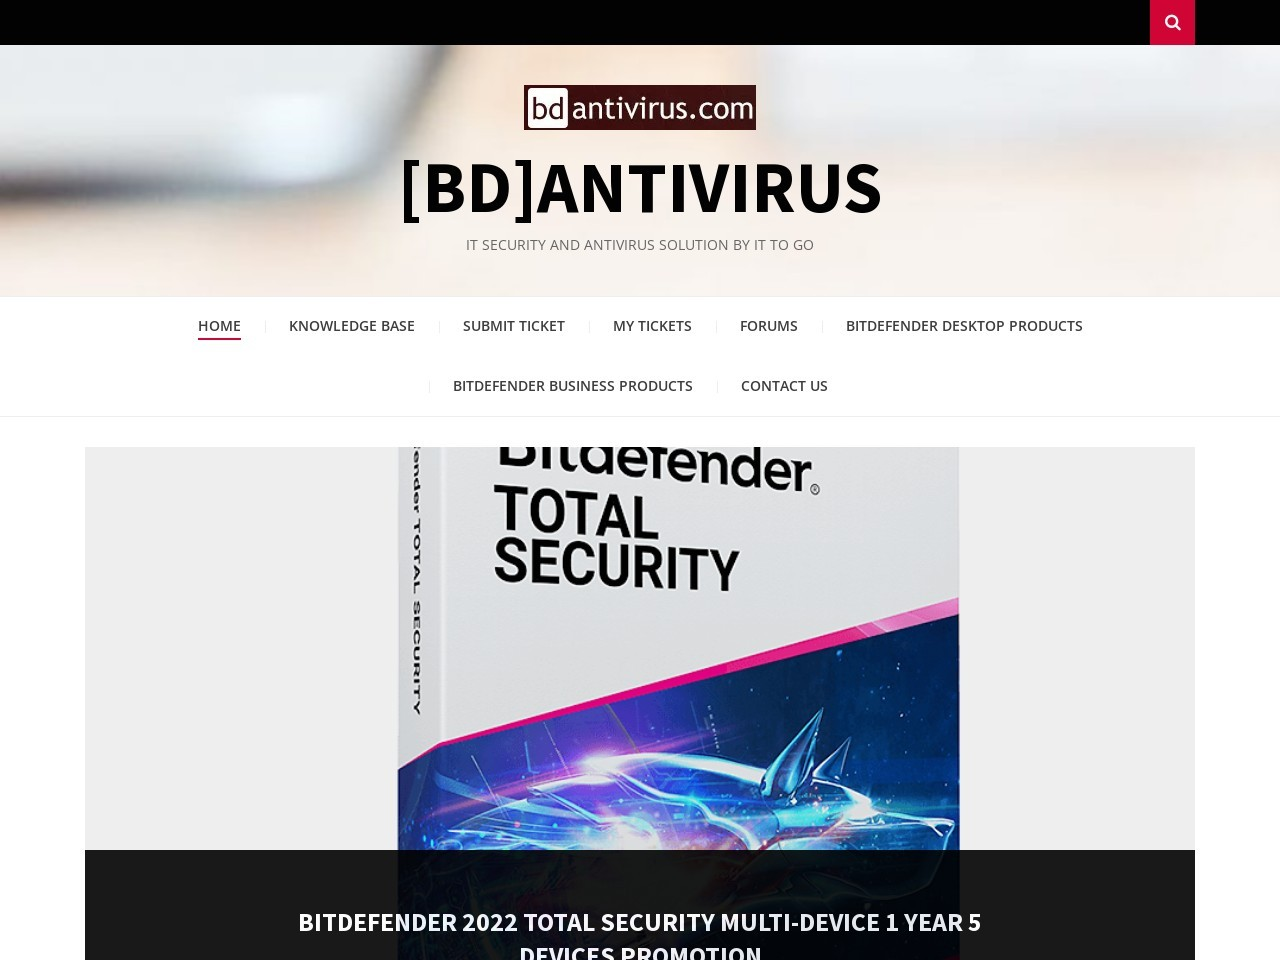 BDAntivirus.com